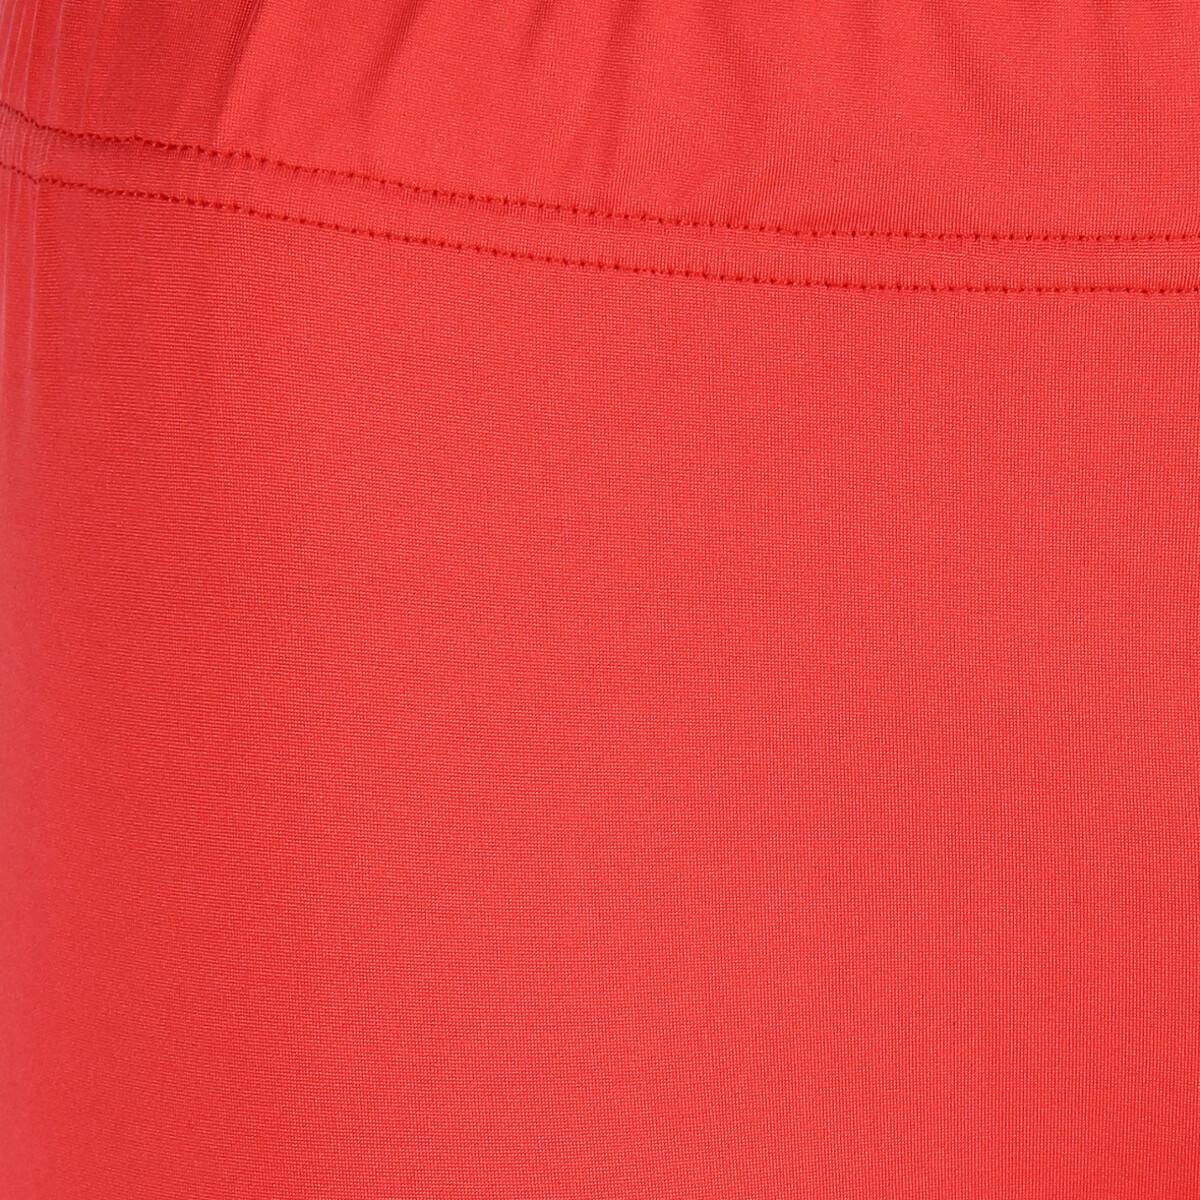 Bild 3 von Damen Capri Leggings